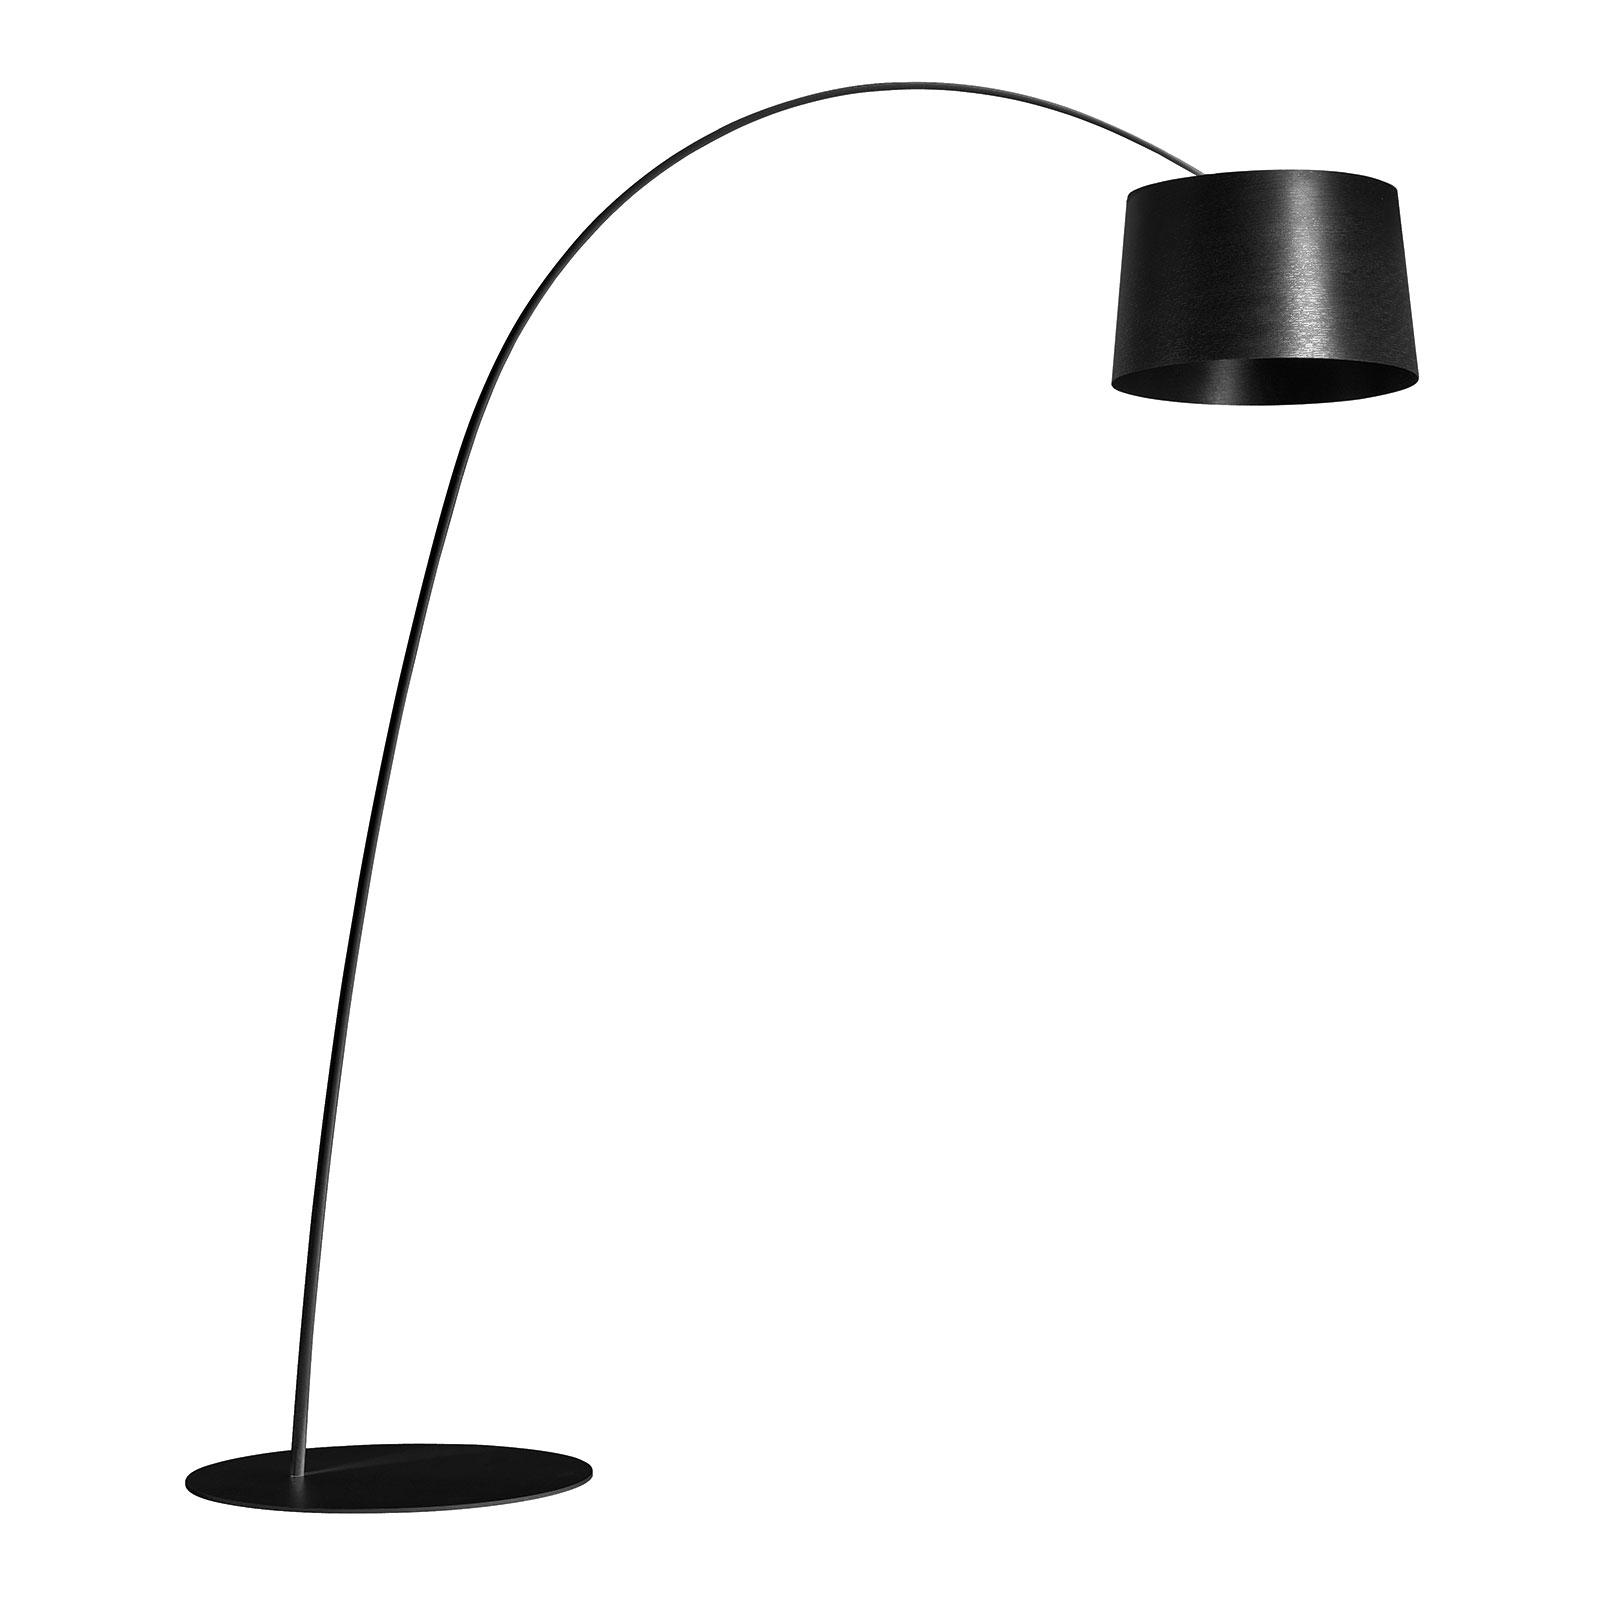 Foscarini Twiggy lampada LED ad arco, nero